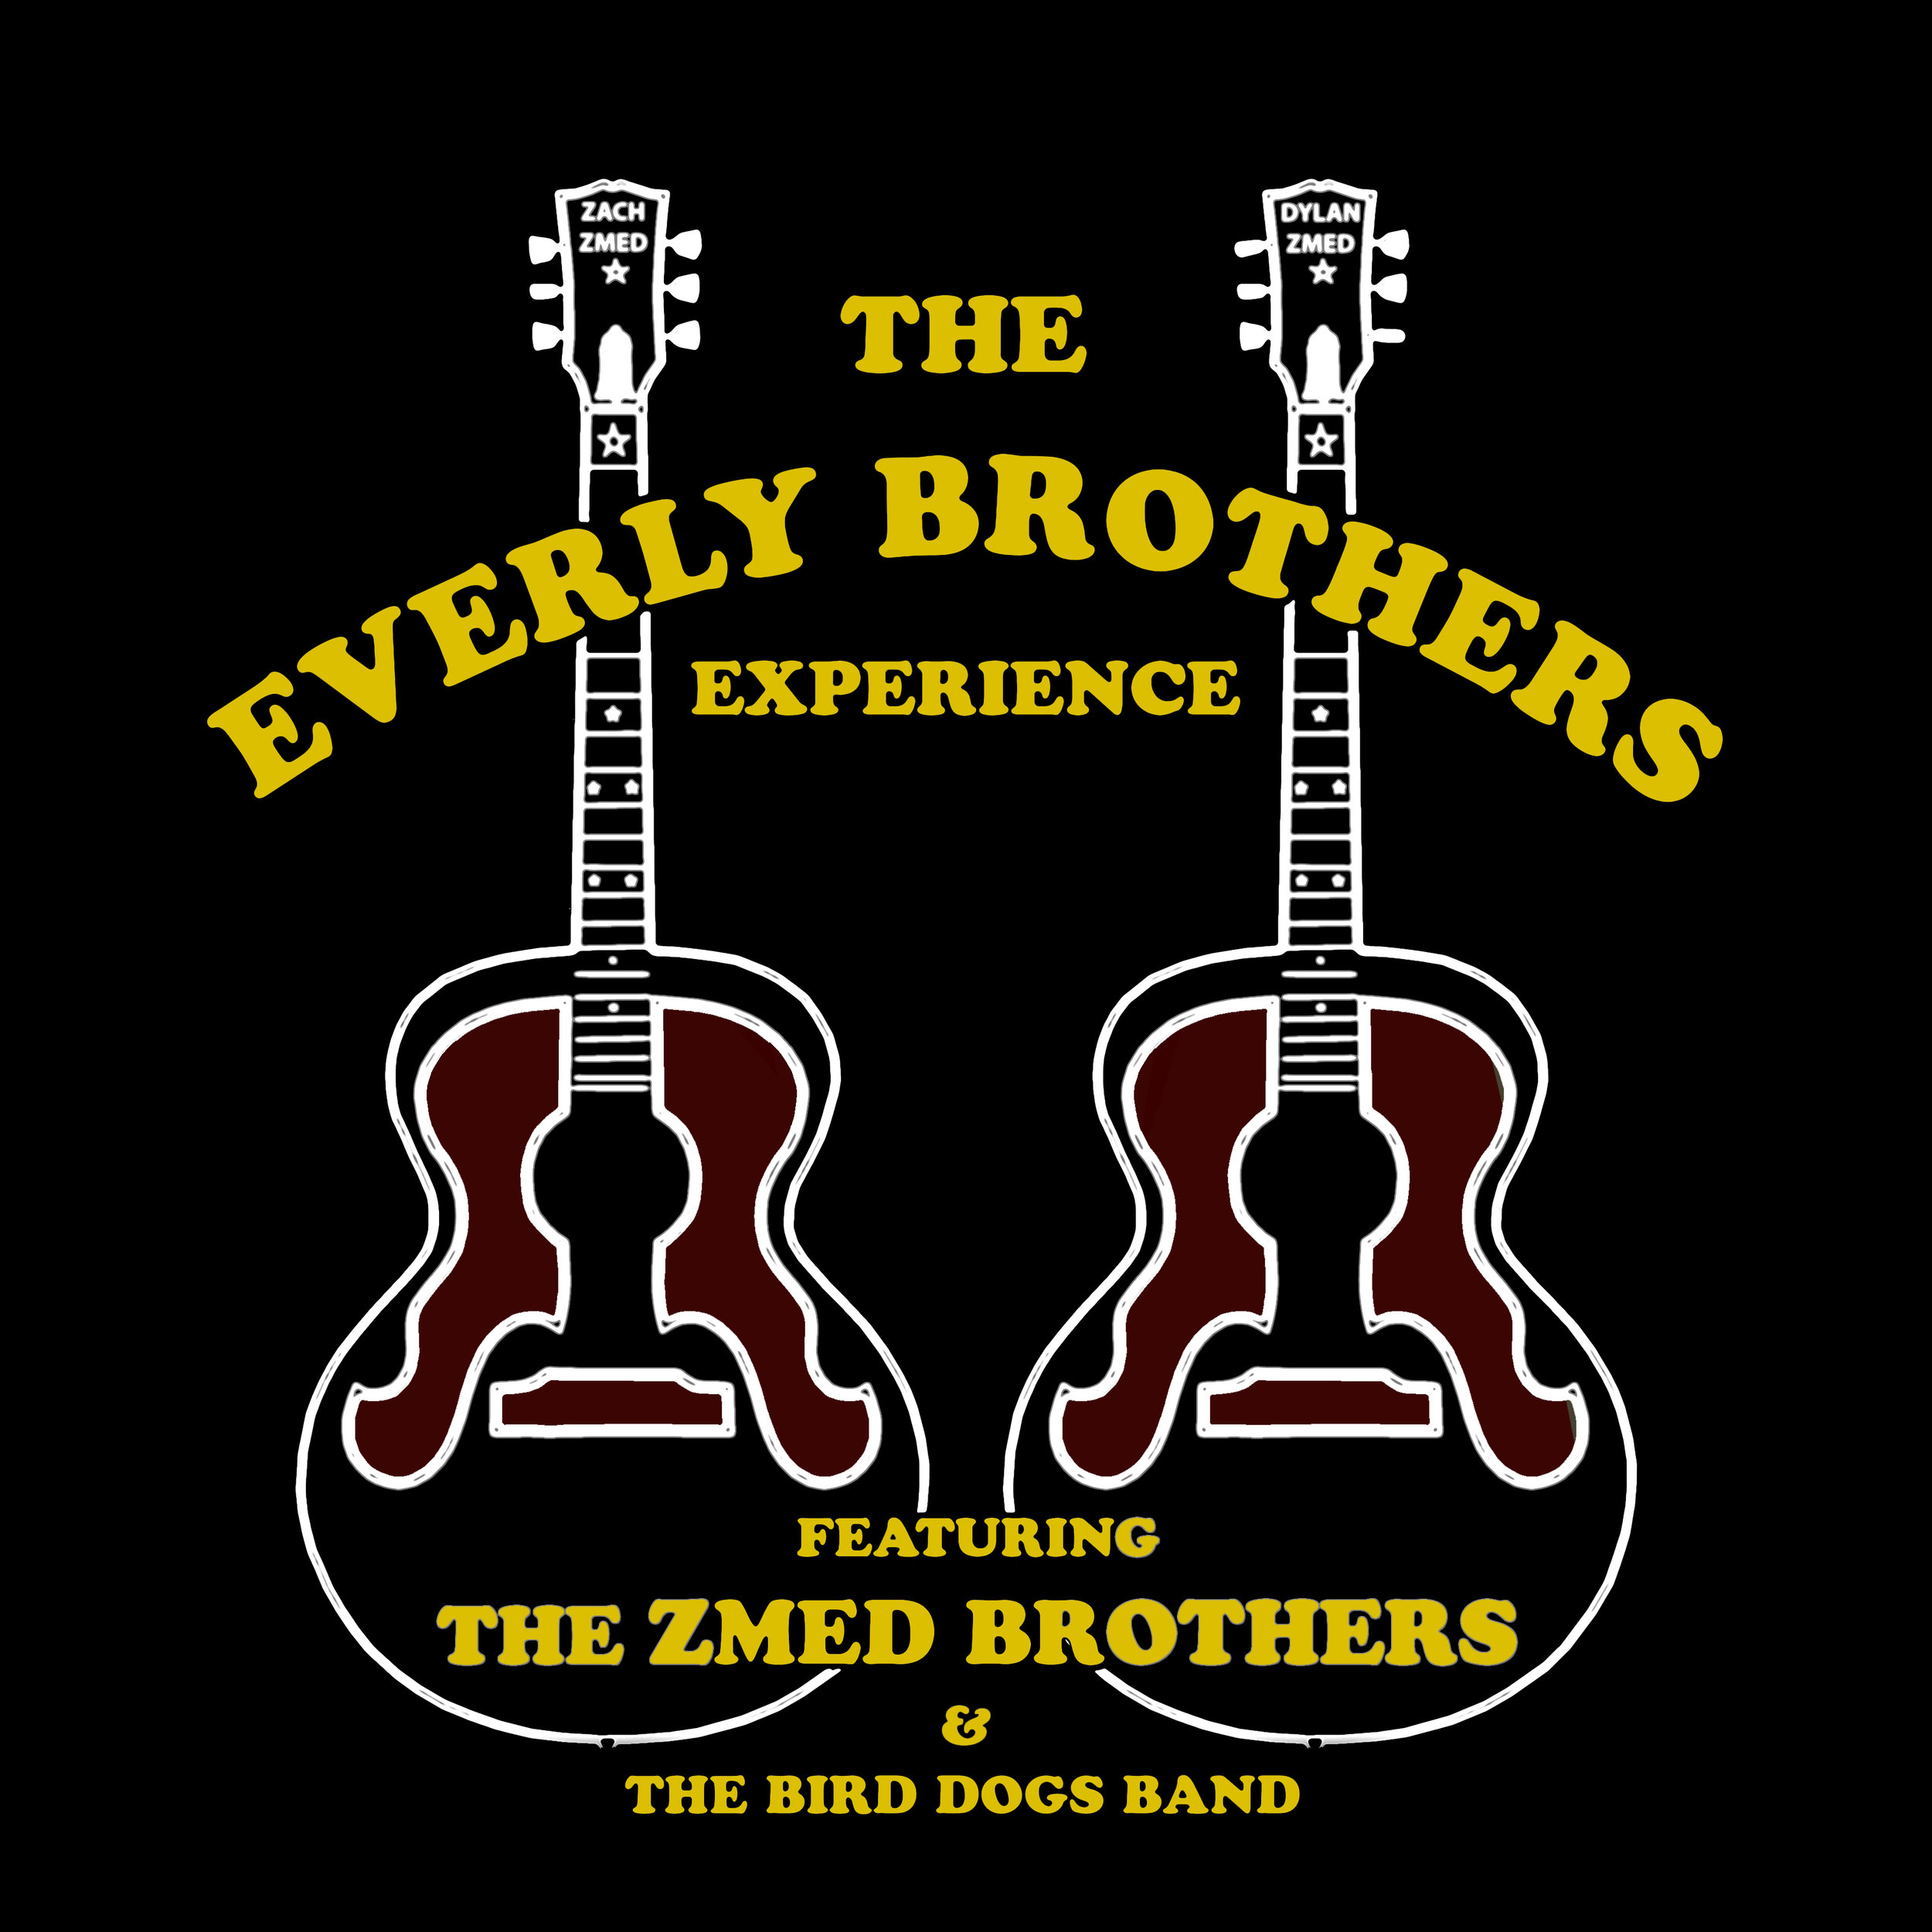 TheEverlyBrothersExplogo2017YRB.jpg